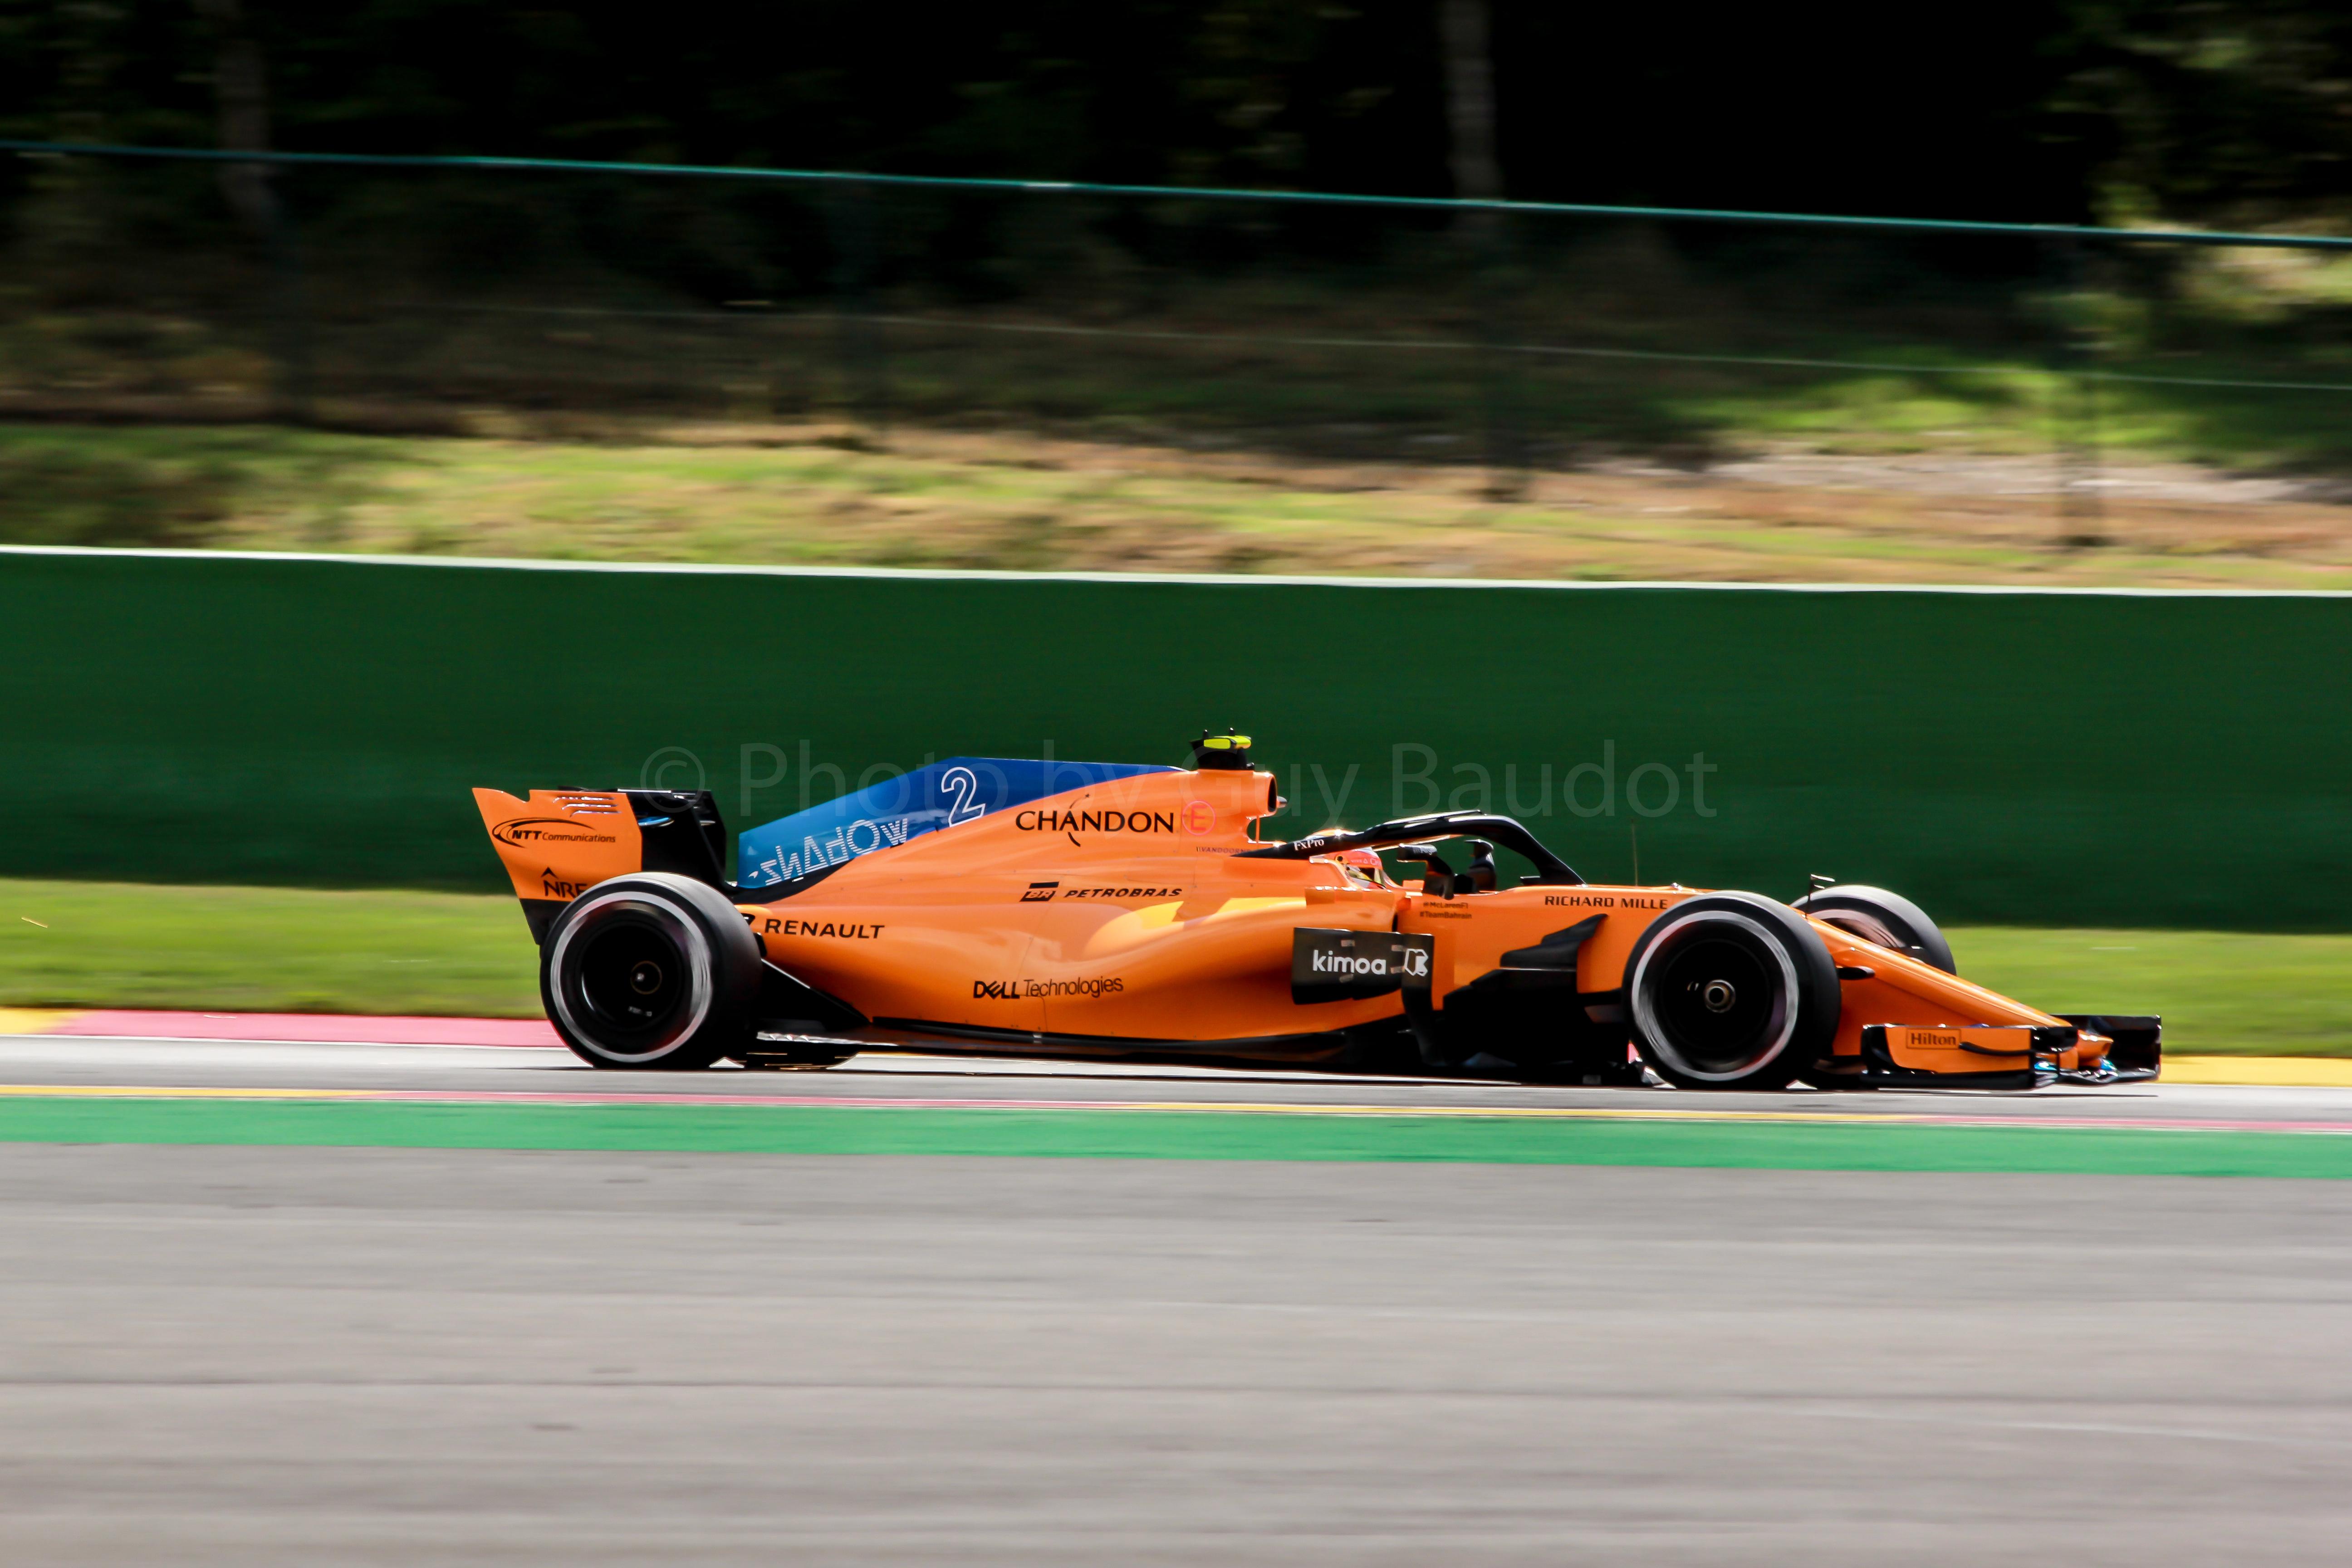 Formule 1 op Franchorchamps. Guy Baudot